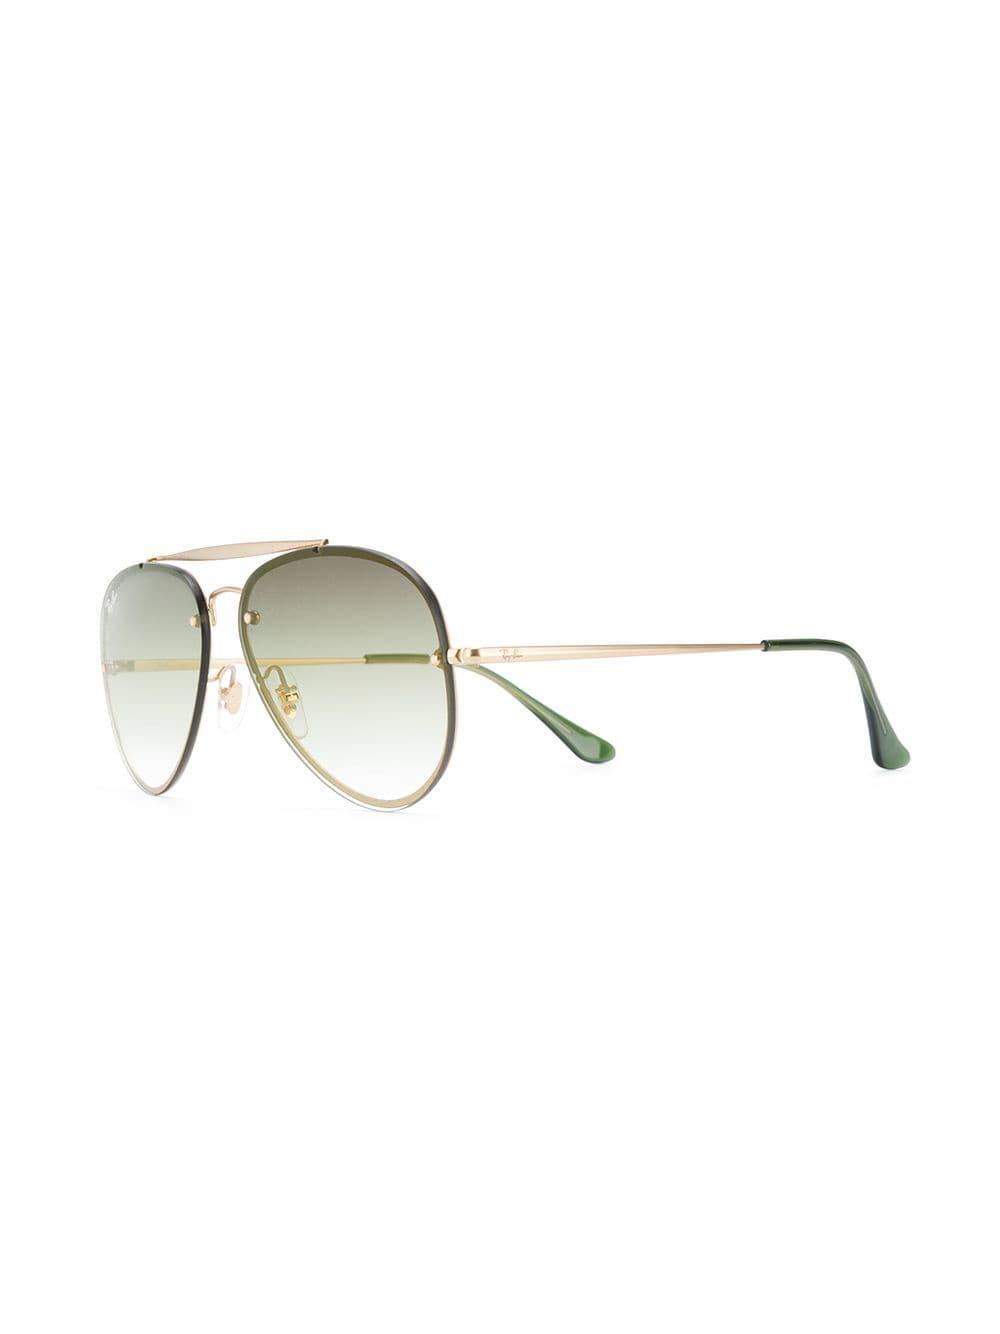 2f6414d3c9 Ray-Ban - Metallic Blaze Polarized Aviator Sunglasses - Lyst. View  fullscreen